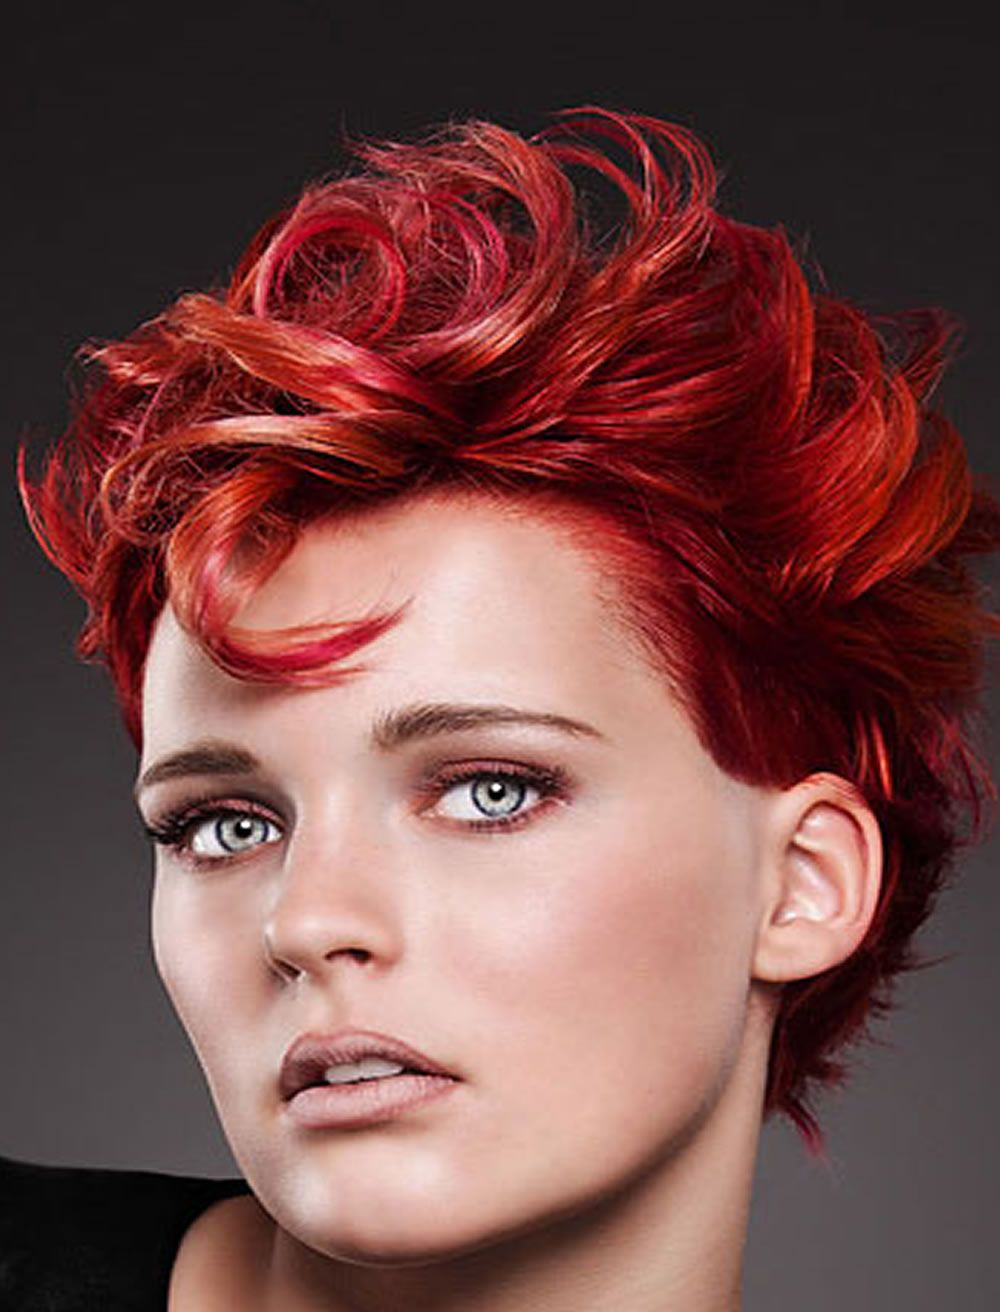 Rote Haarfarbe für kurze Frisuren | Cooles Haarschnitt ...